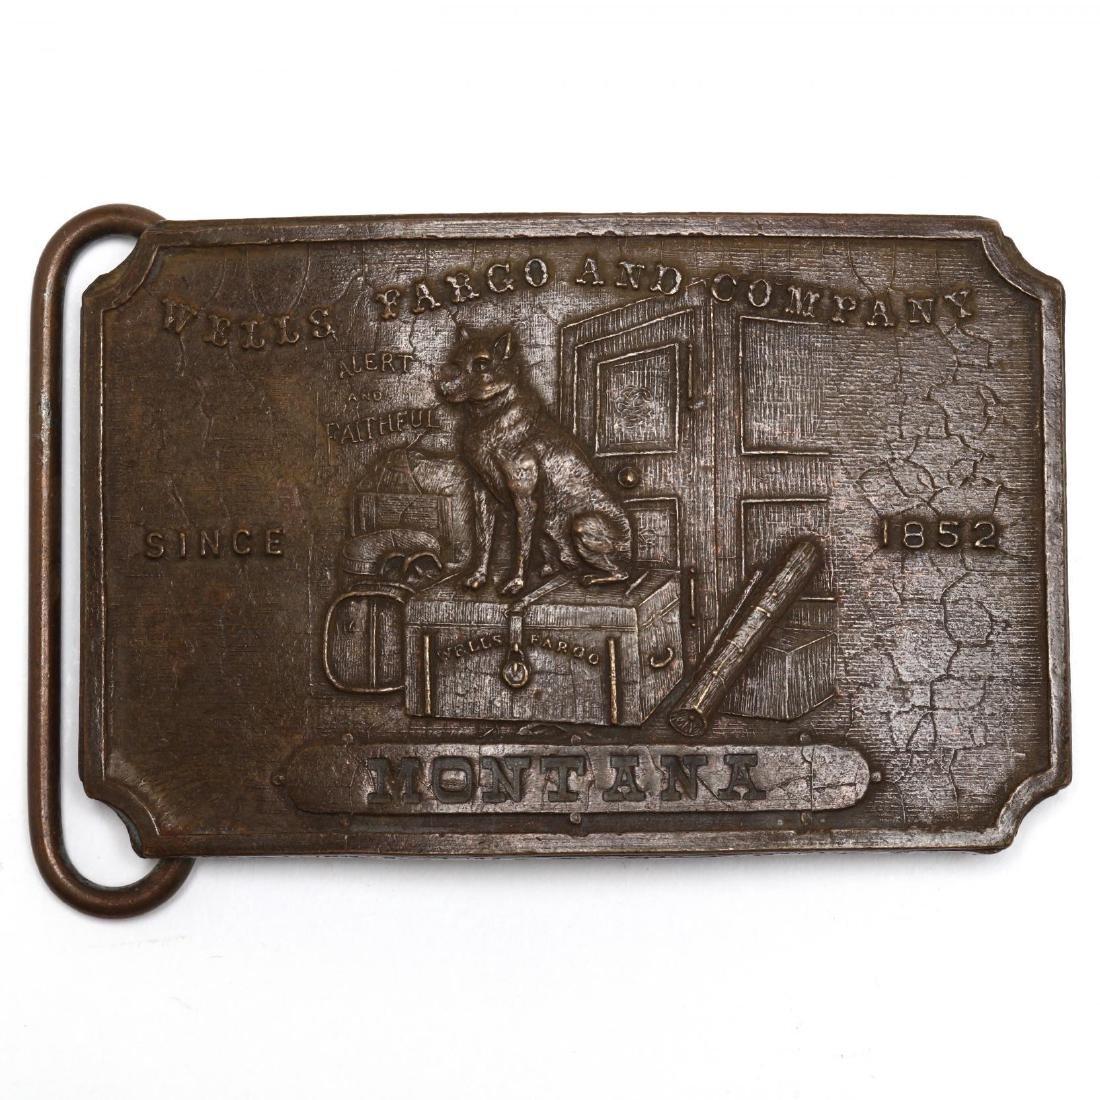 Five Vintage Tiffany Belt Buckles for Wells Fargo & - 5